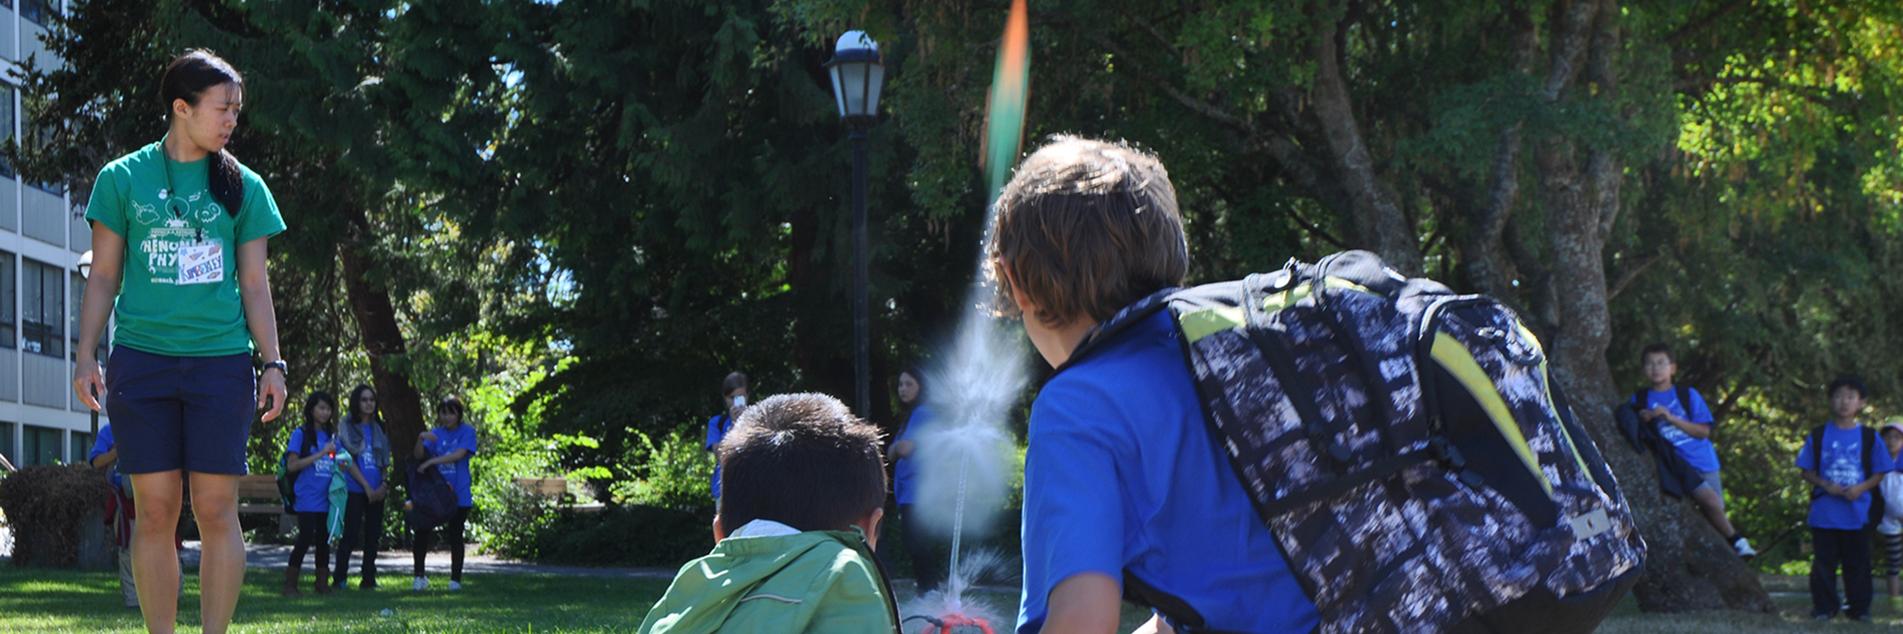 Phenomenal Physics Summer Camps